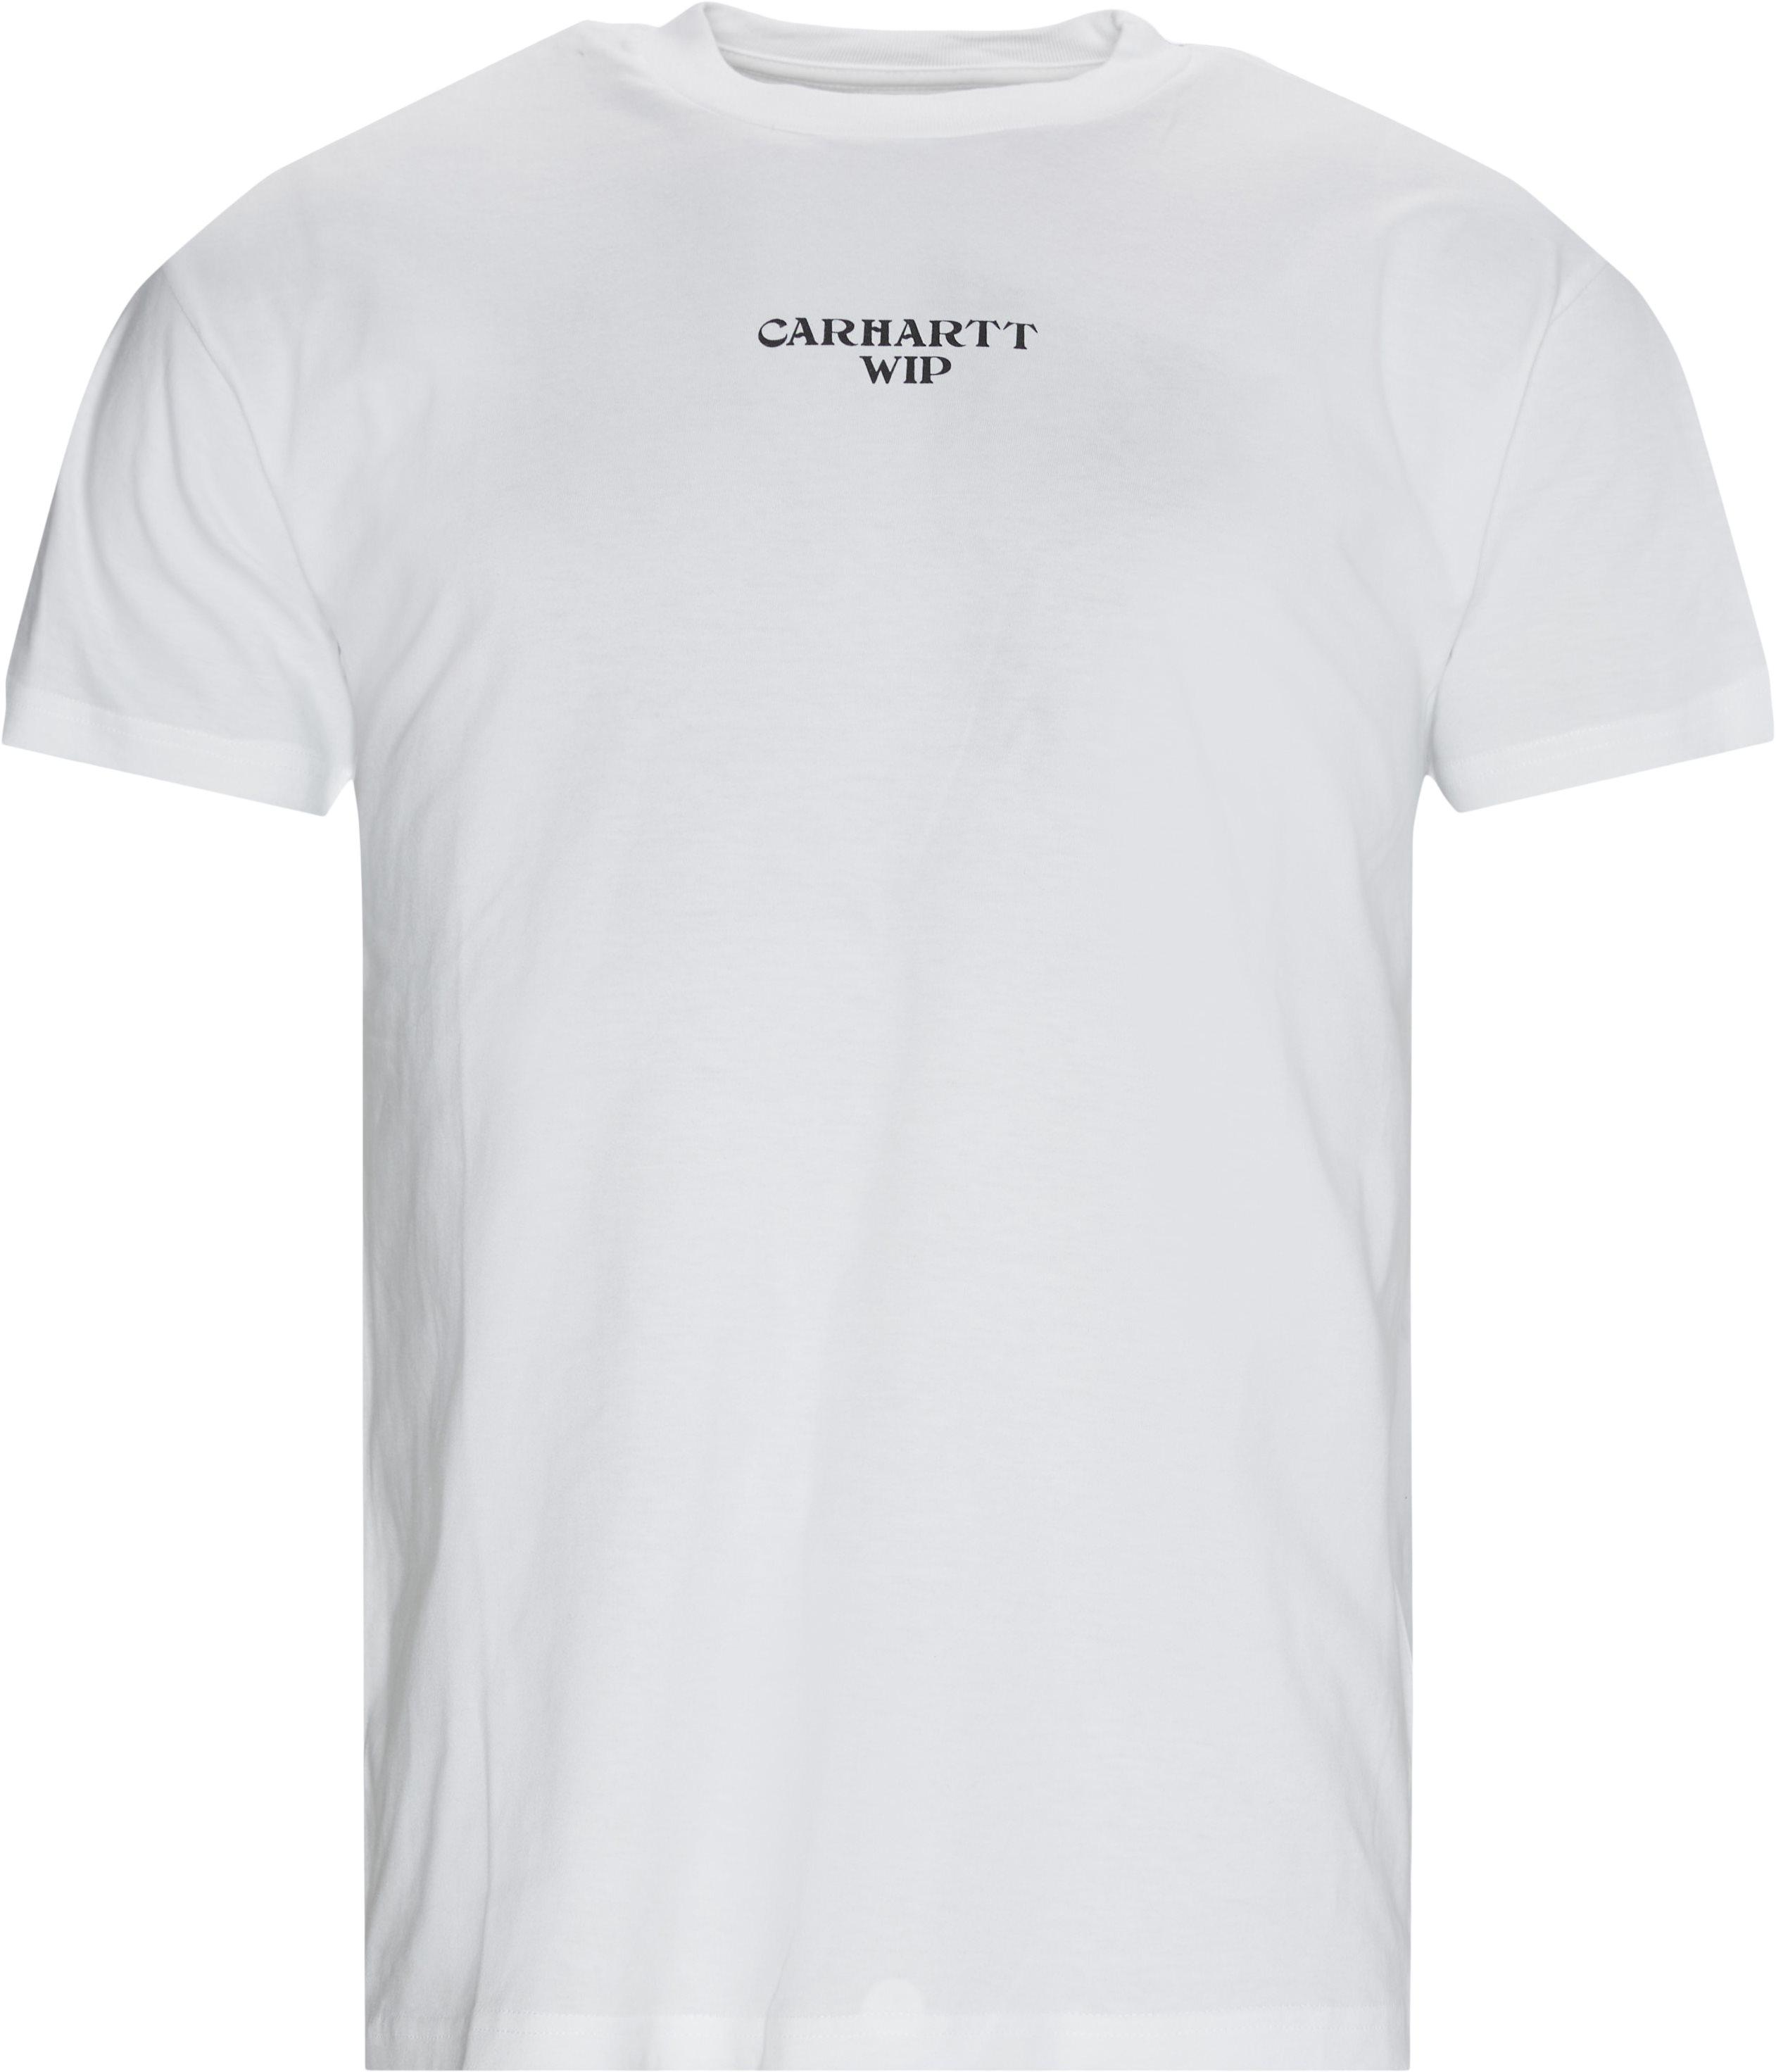 Panic Tee - T-shirts - Regular - Vit